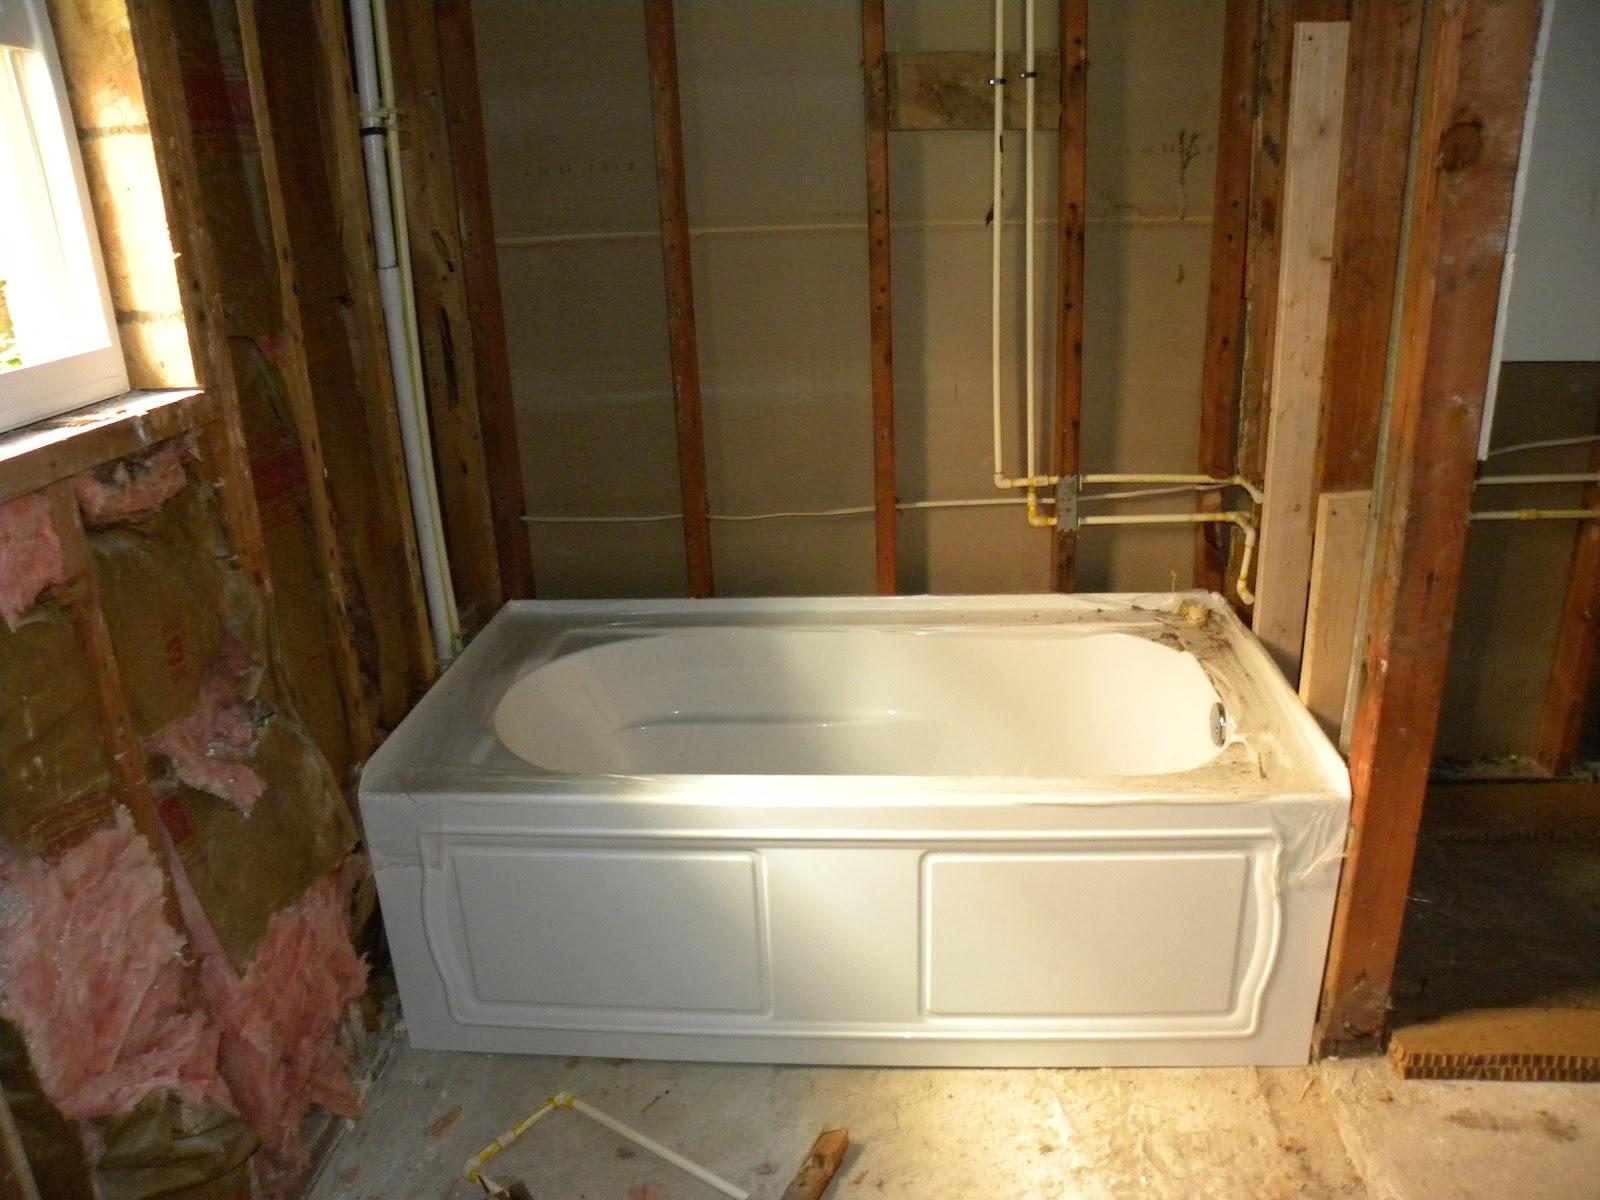 Fine Tub Paint Thin Painting A Bathtub Rectangular Paint For Bathtub Painting Bathtub Old Bath Refinishing Service Orange Bathtub Refinishing Companies